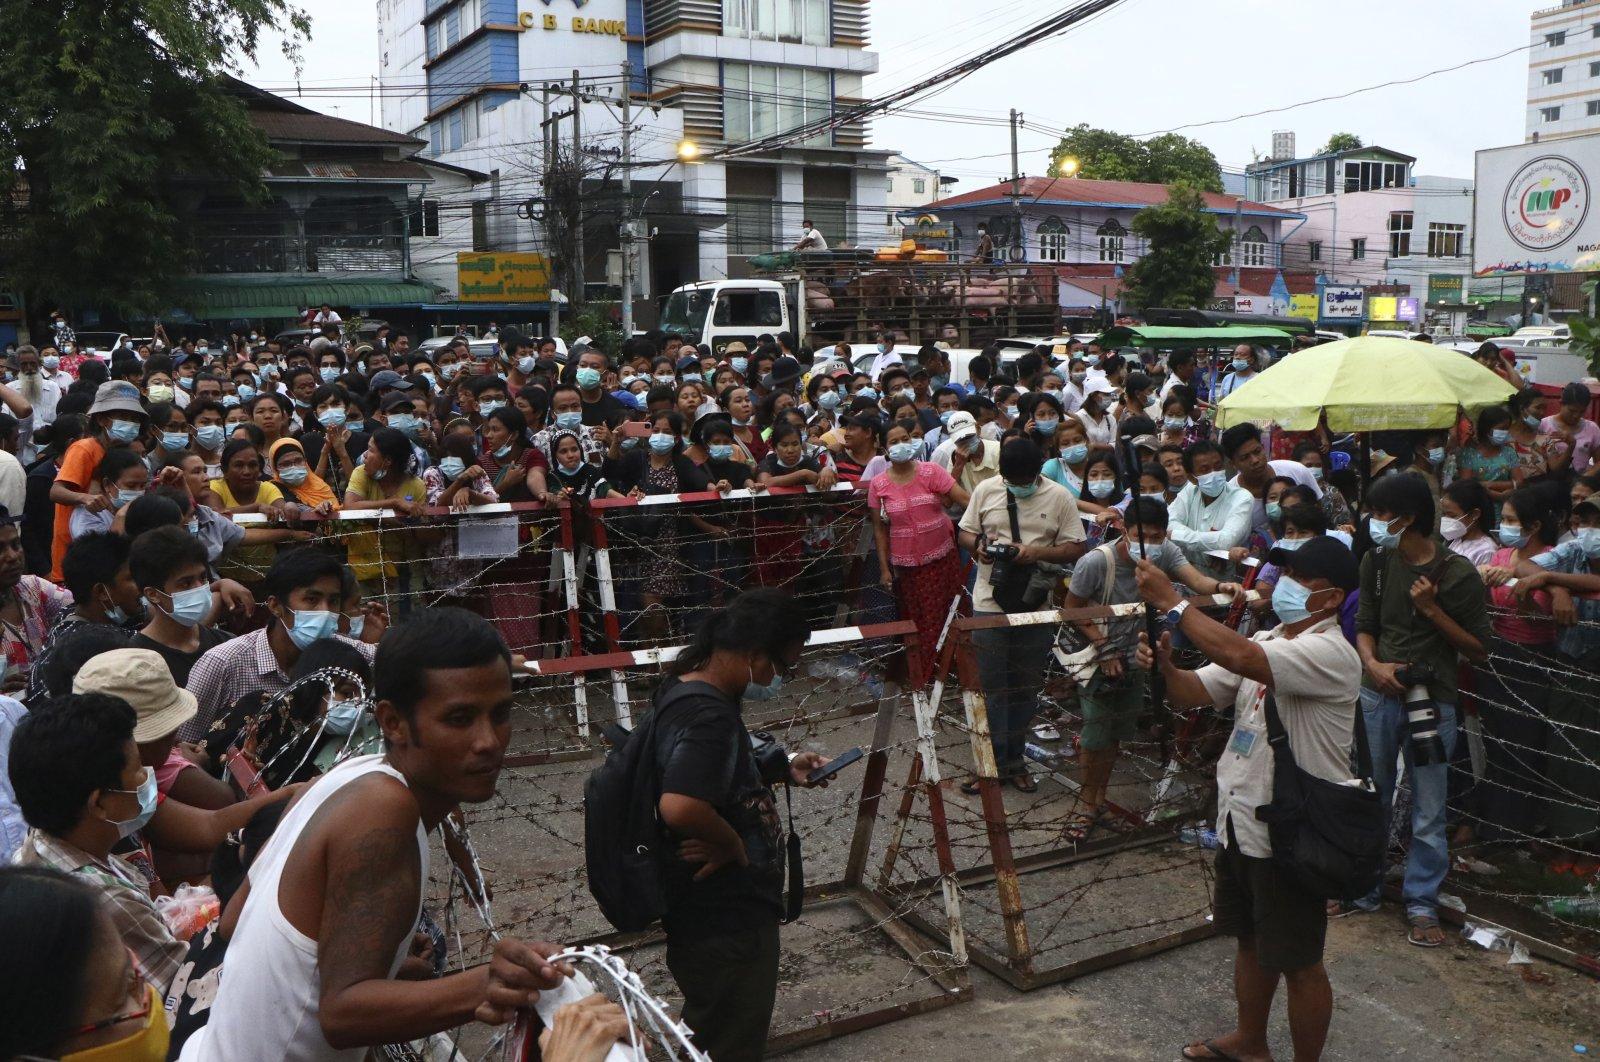 A crowd waits outside Insein Prison in Yangon, Myanmar Wednesday, June 30, 2021. (AP Photo)